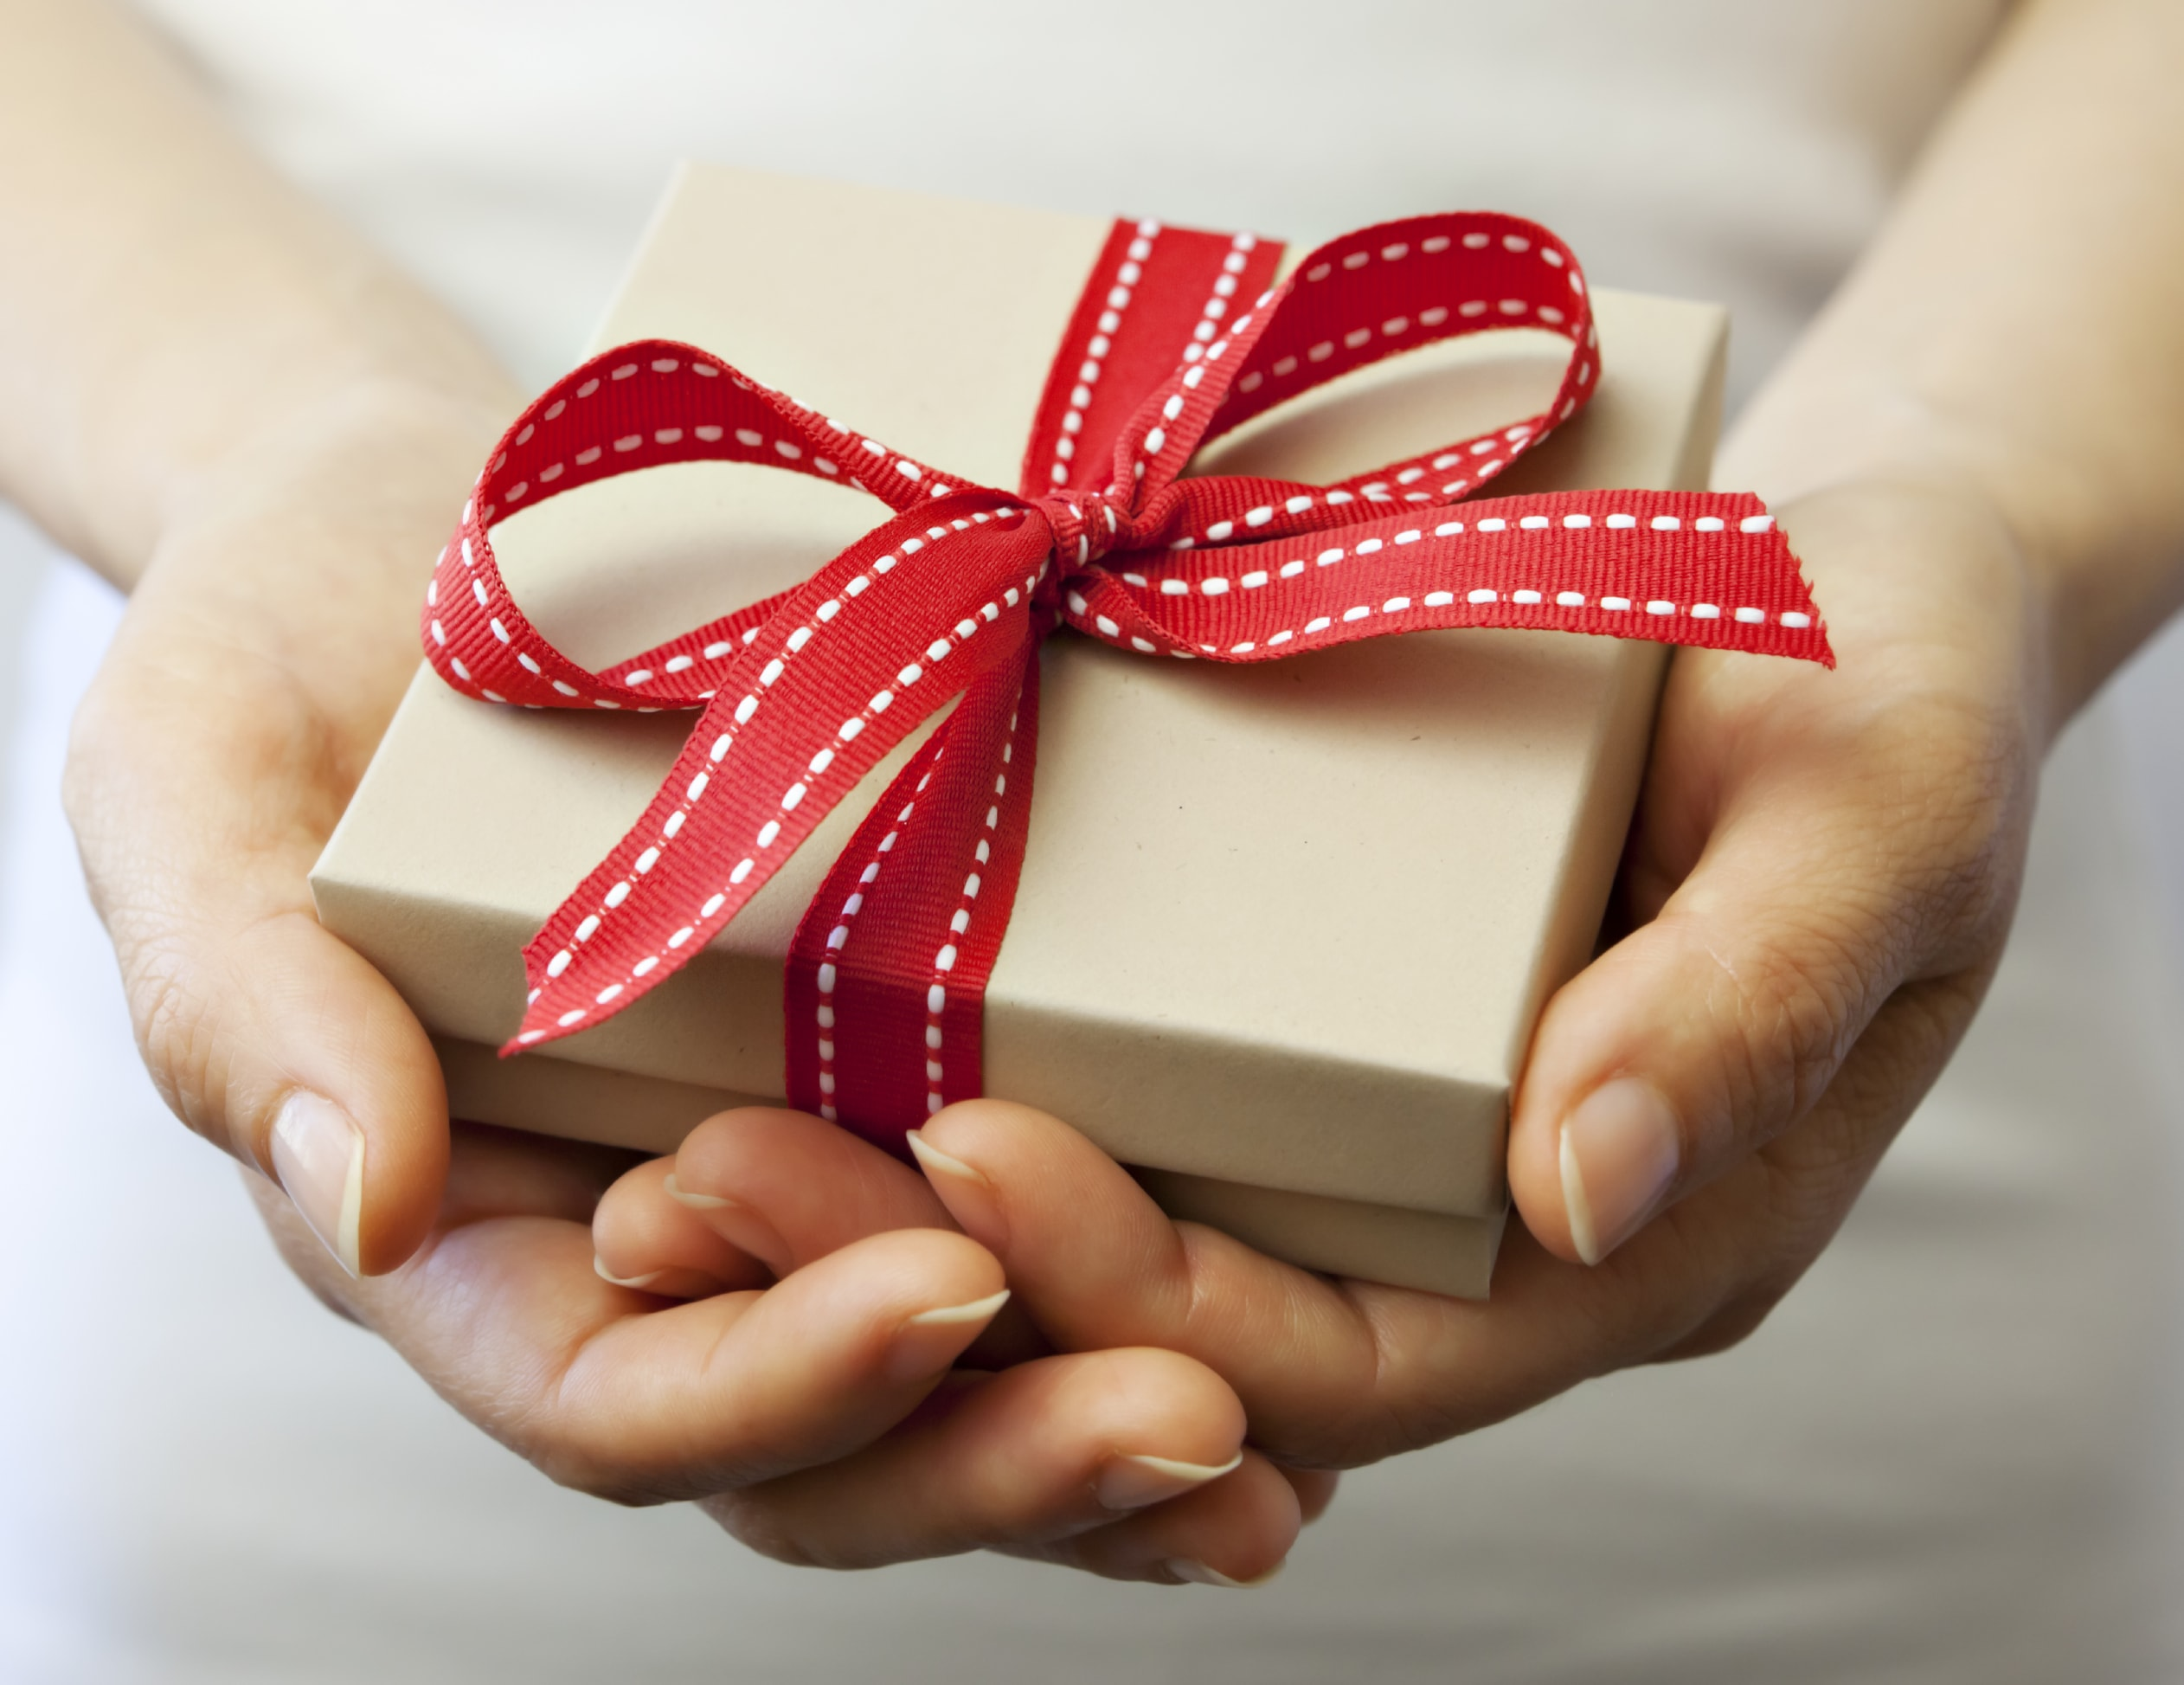 gift-iStock_000018117668Large-min